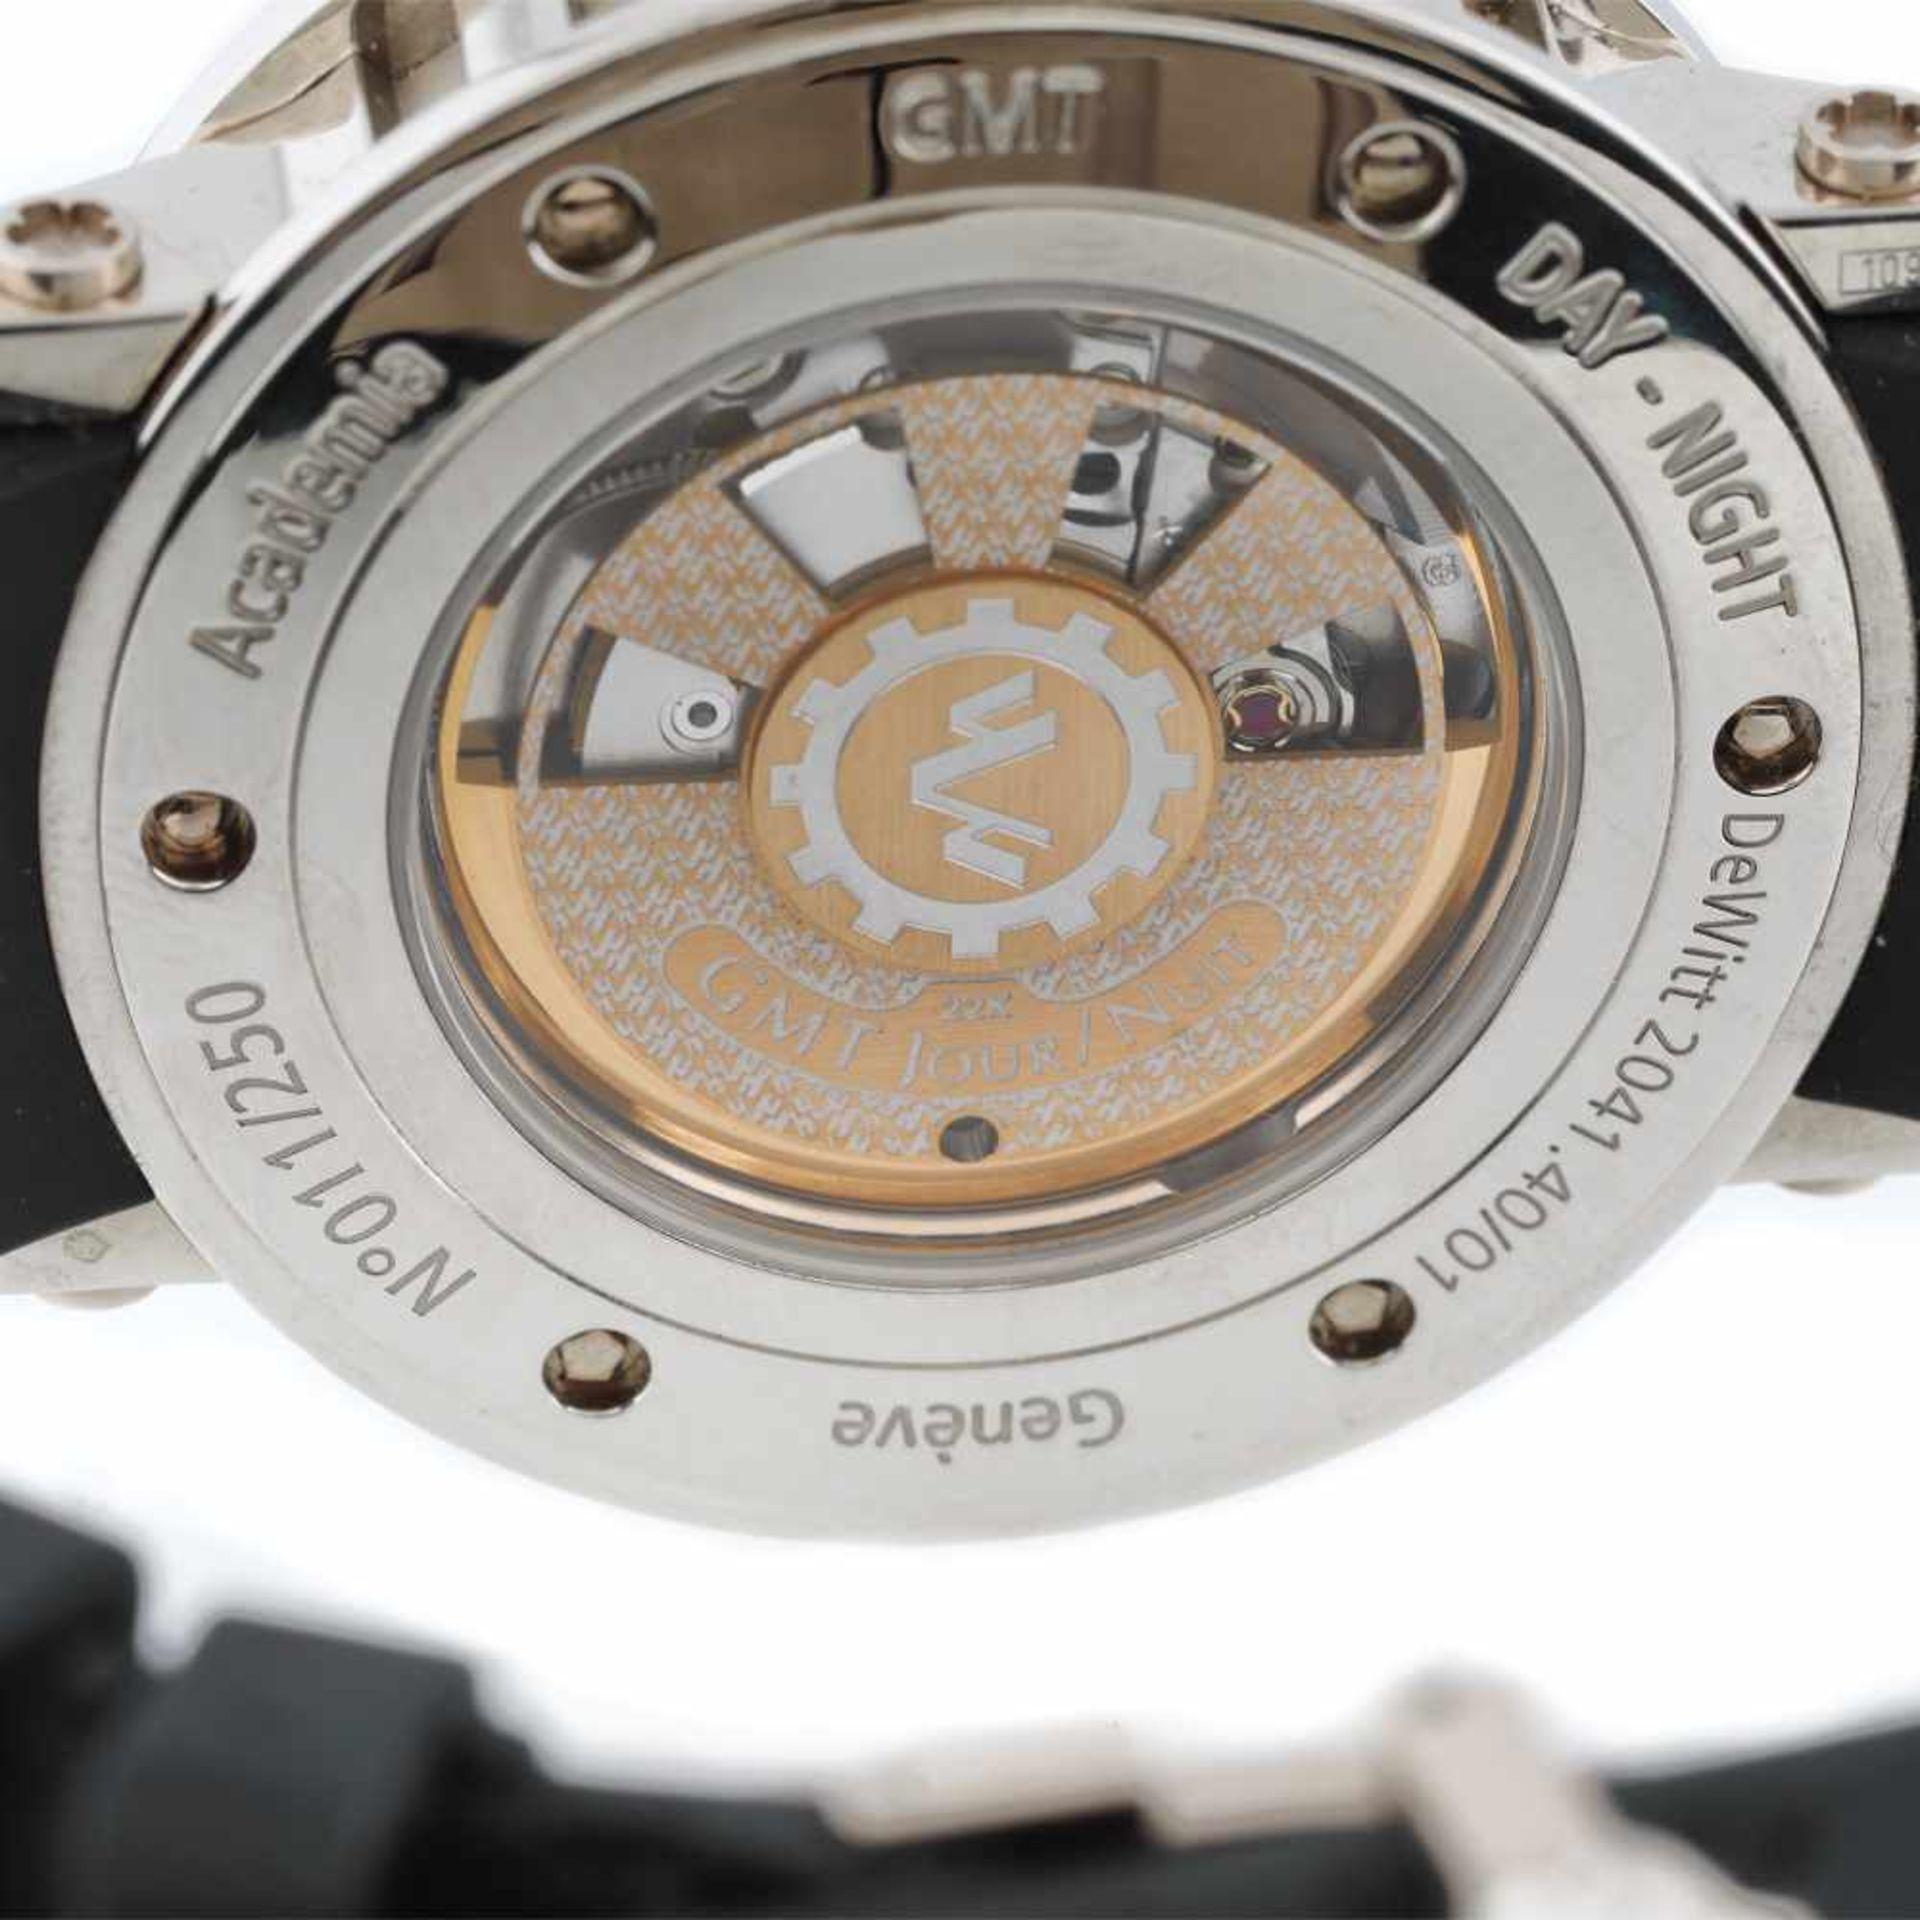 Dewitt Academia Triple Complication wristwatch, limited edition 11/250, provenance documents and ori - Bild 4 aus 4